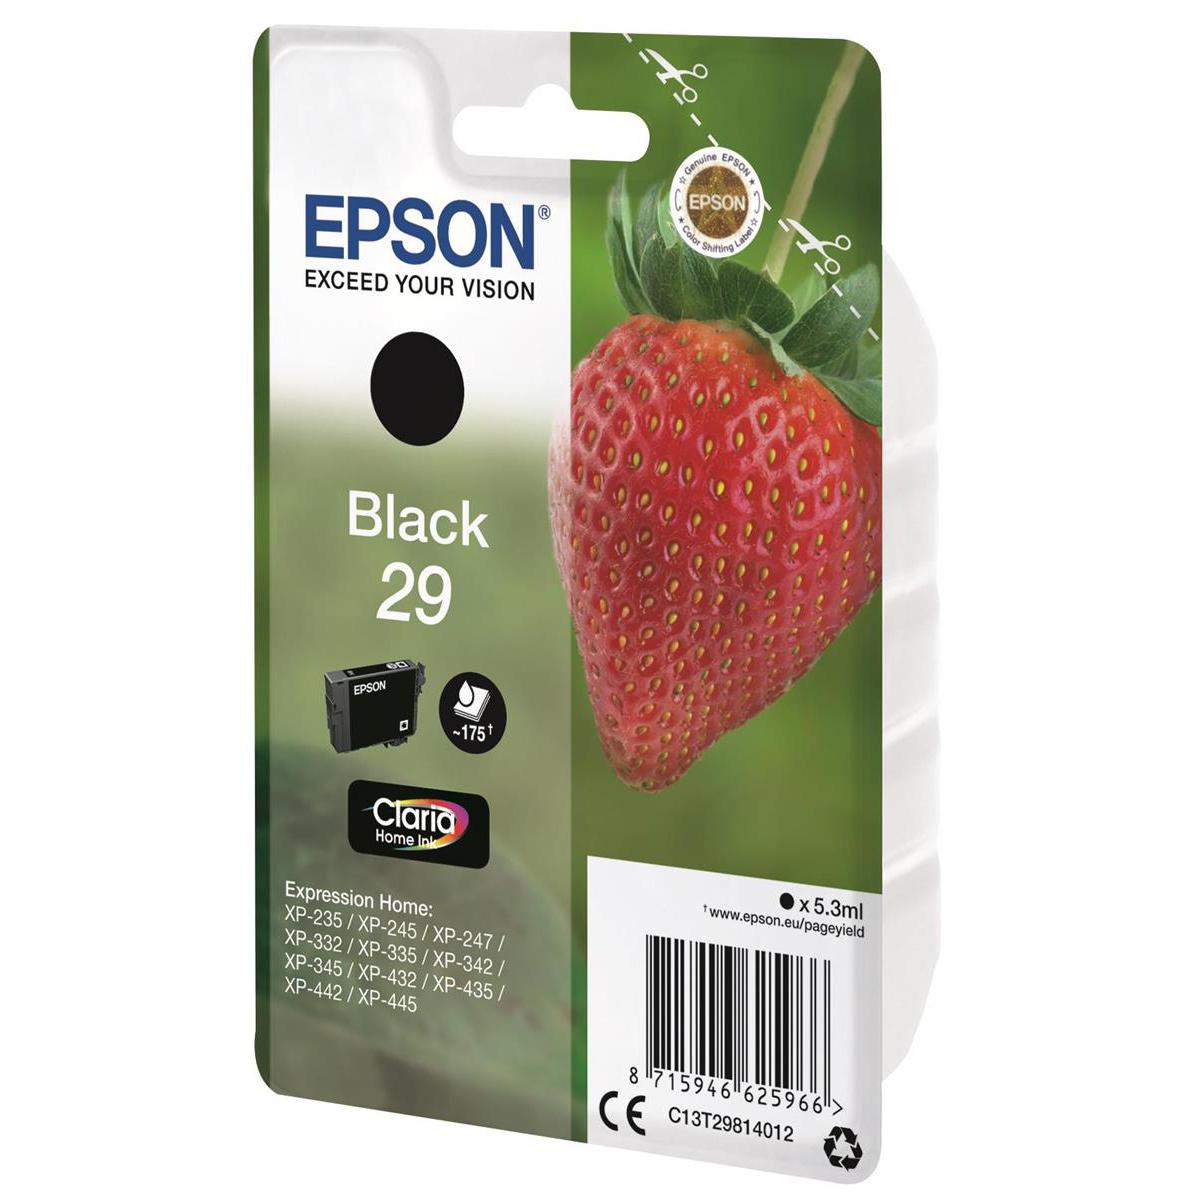 Epson 29 InkJet Cartridge Strawberry Page Life 175pp 5.3ml Black Ref C13T29814012